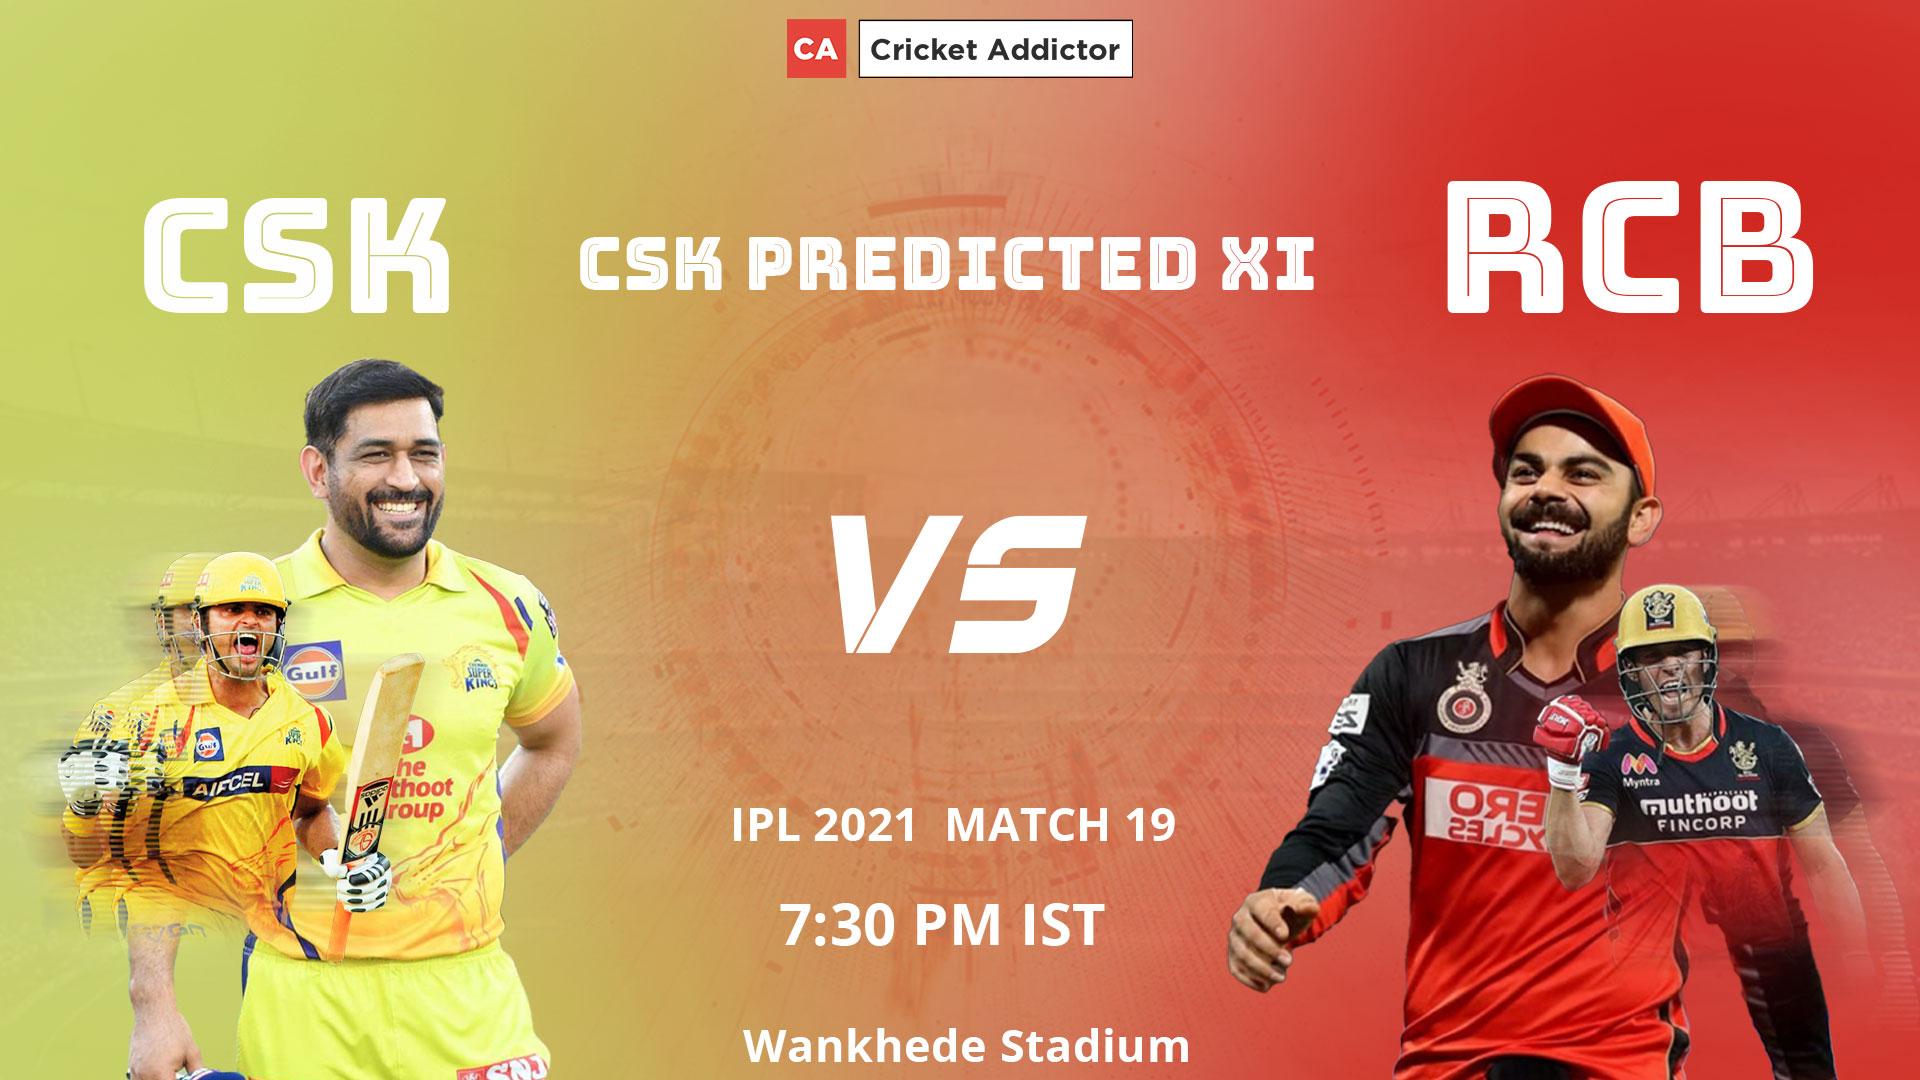 IPL 2021, Chennai Super Kings, CSK, CSK vs RCB, predicted playing XI, playing XI